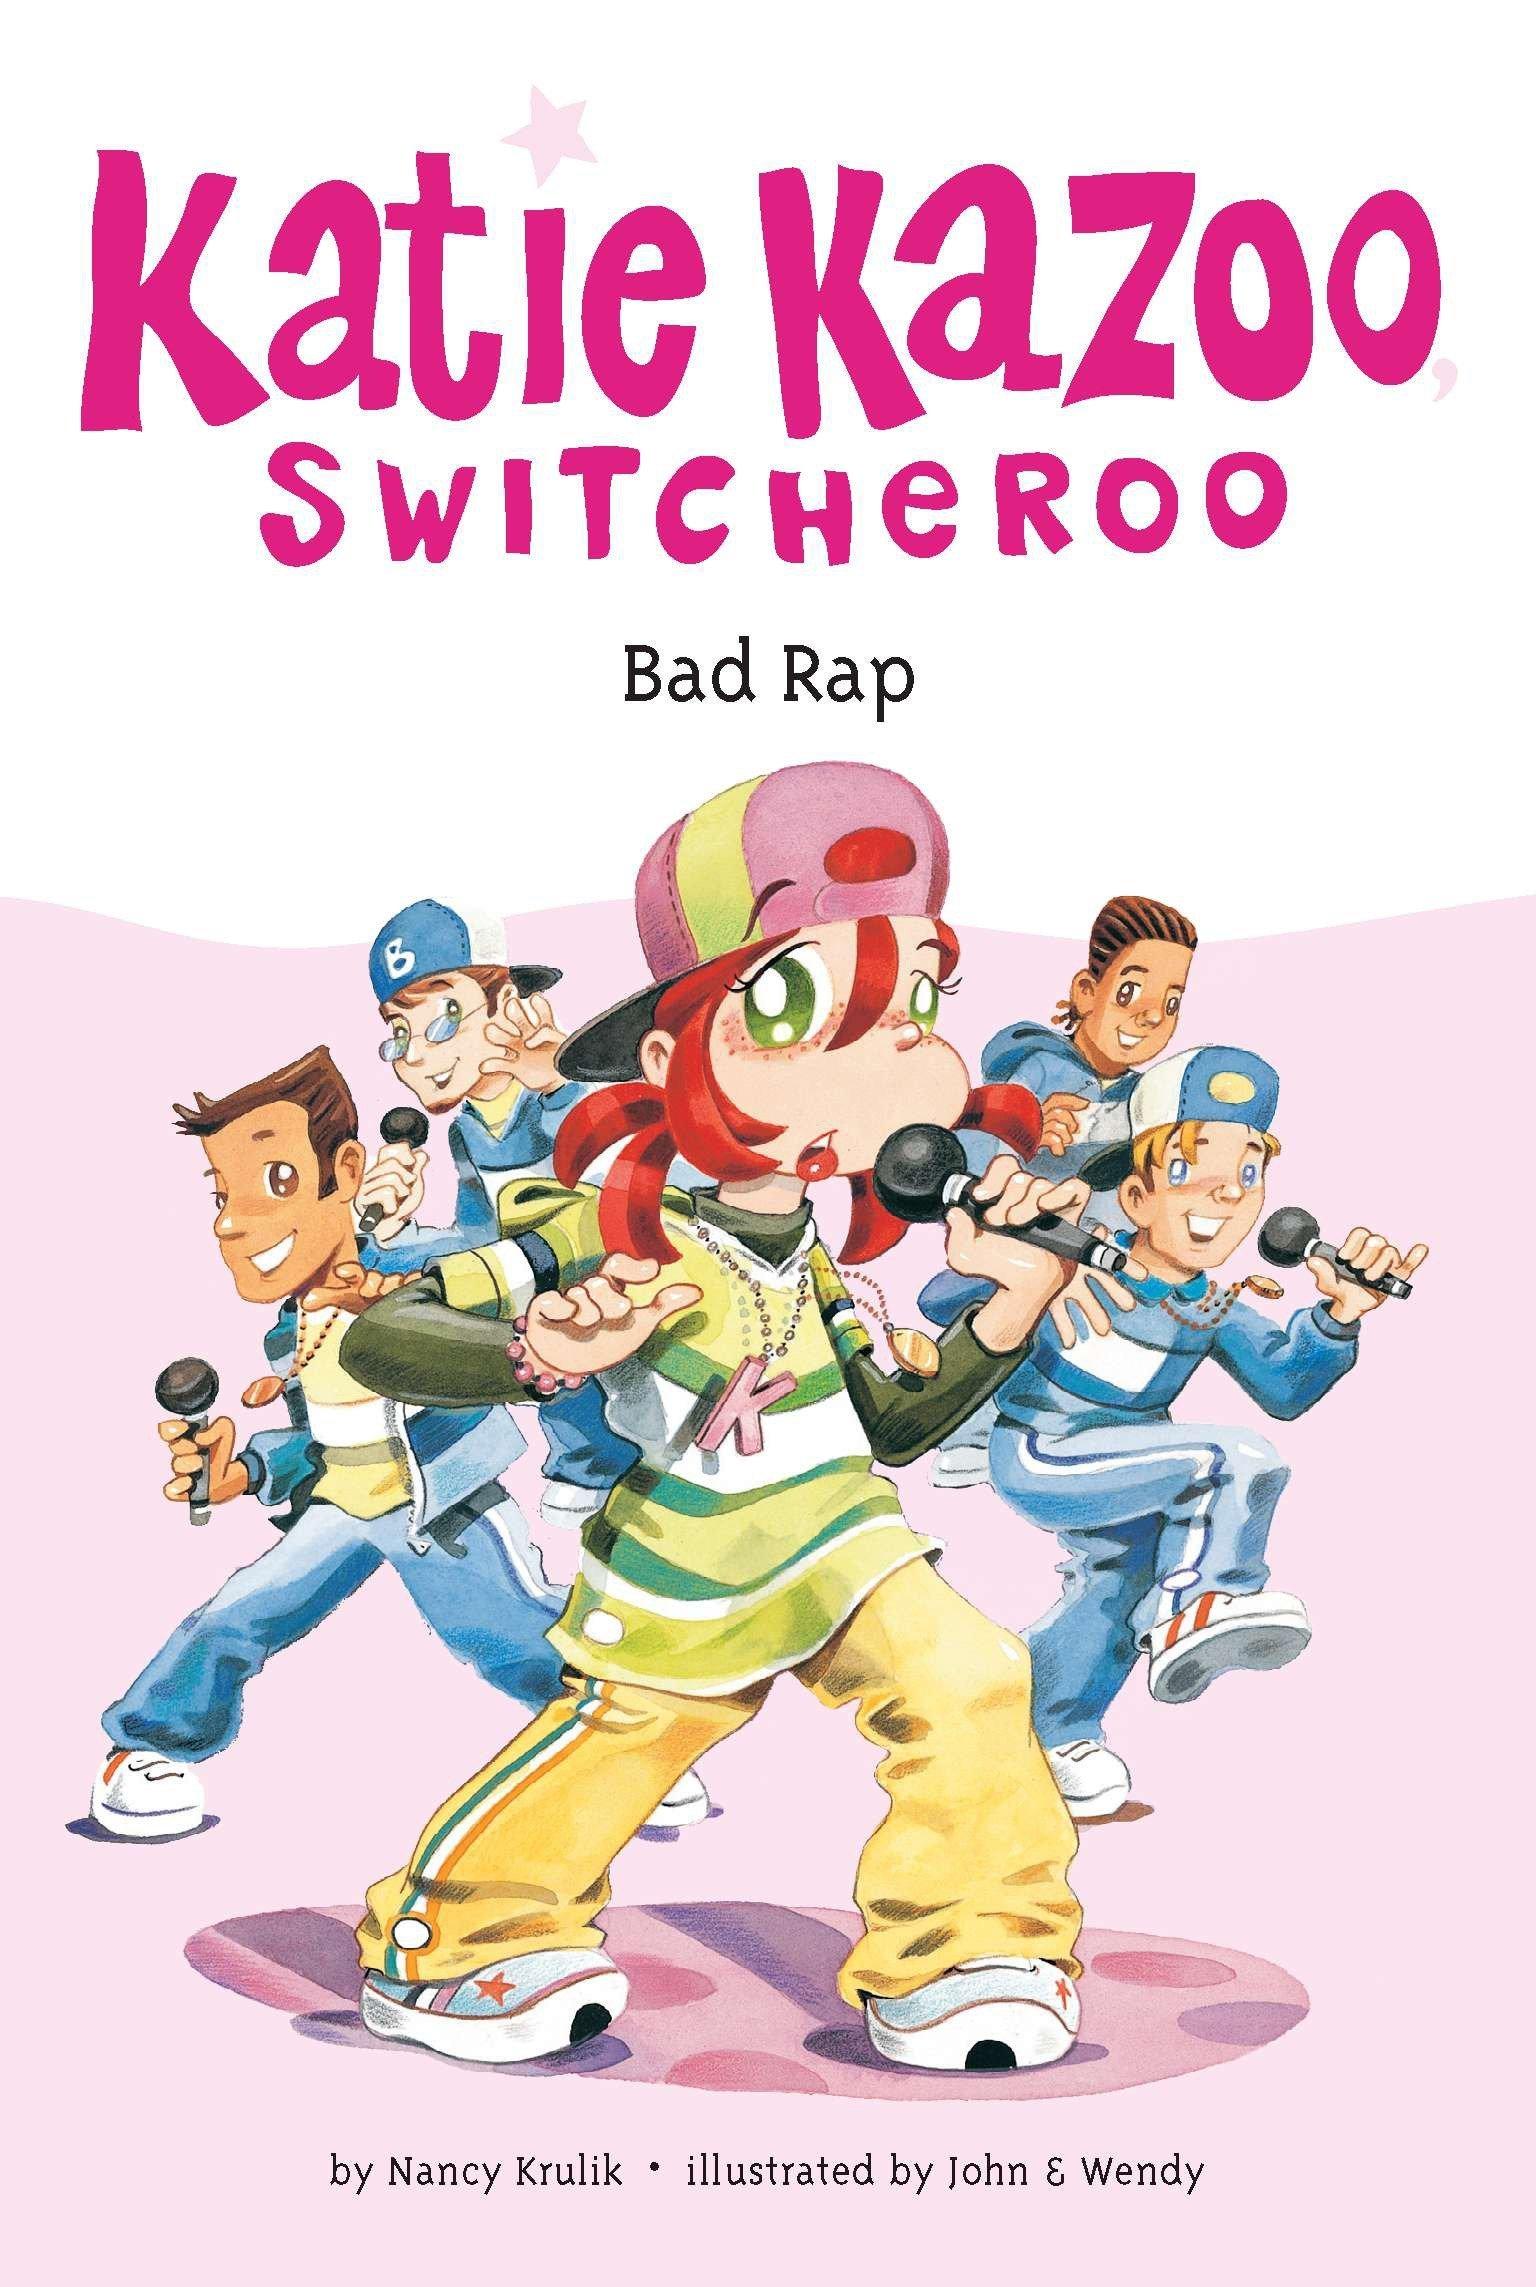 Read Online Bad Rap (Katie Kazoo, Switcheroo No. 16) pdf